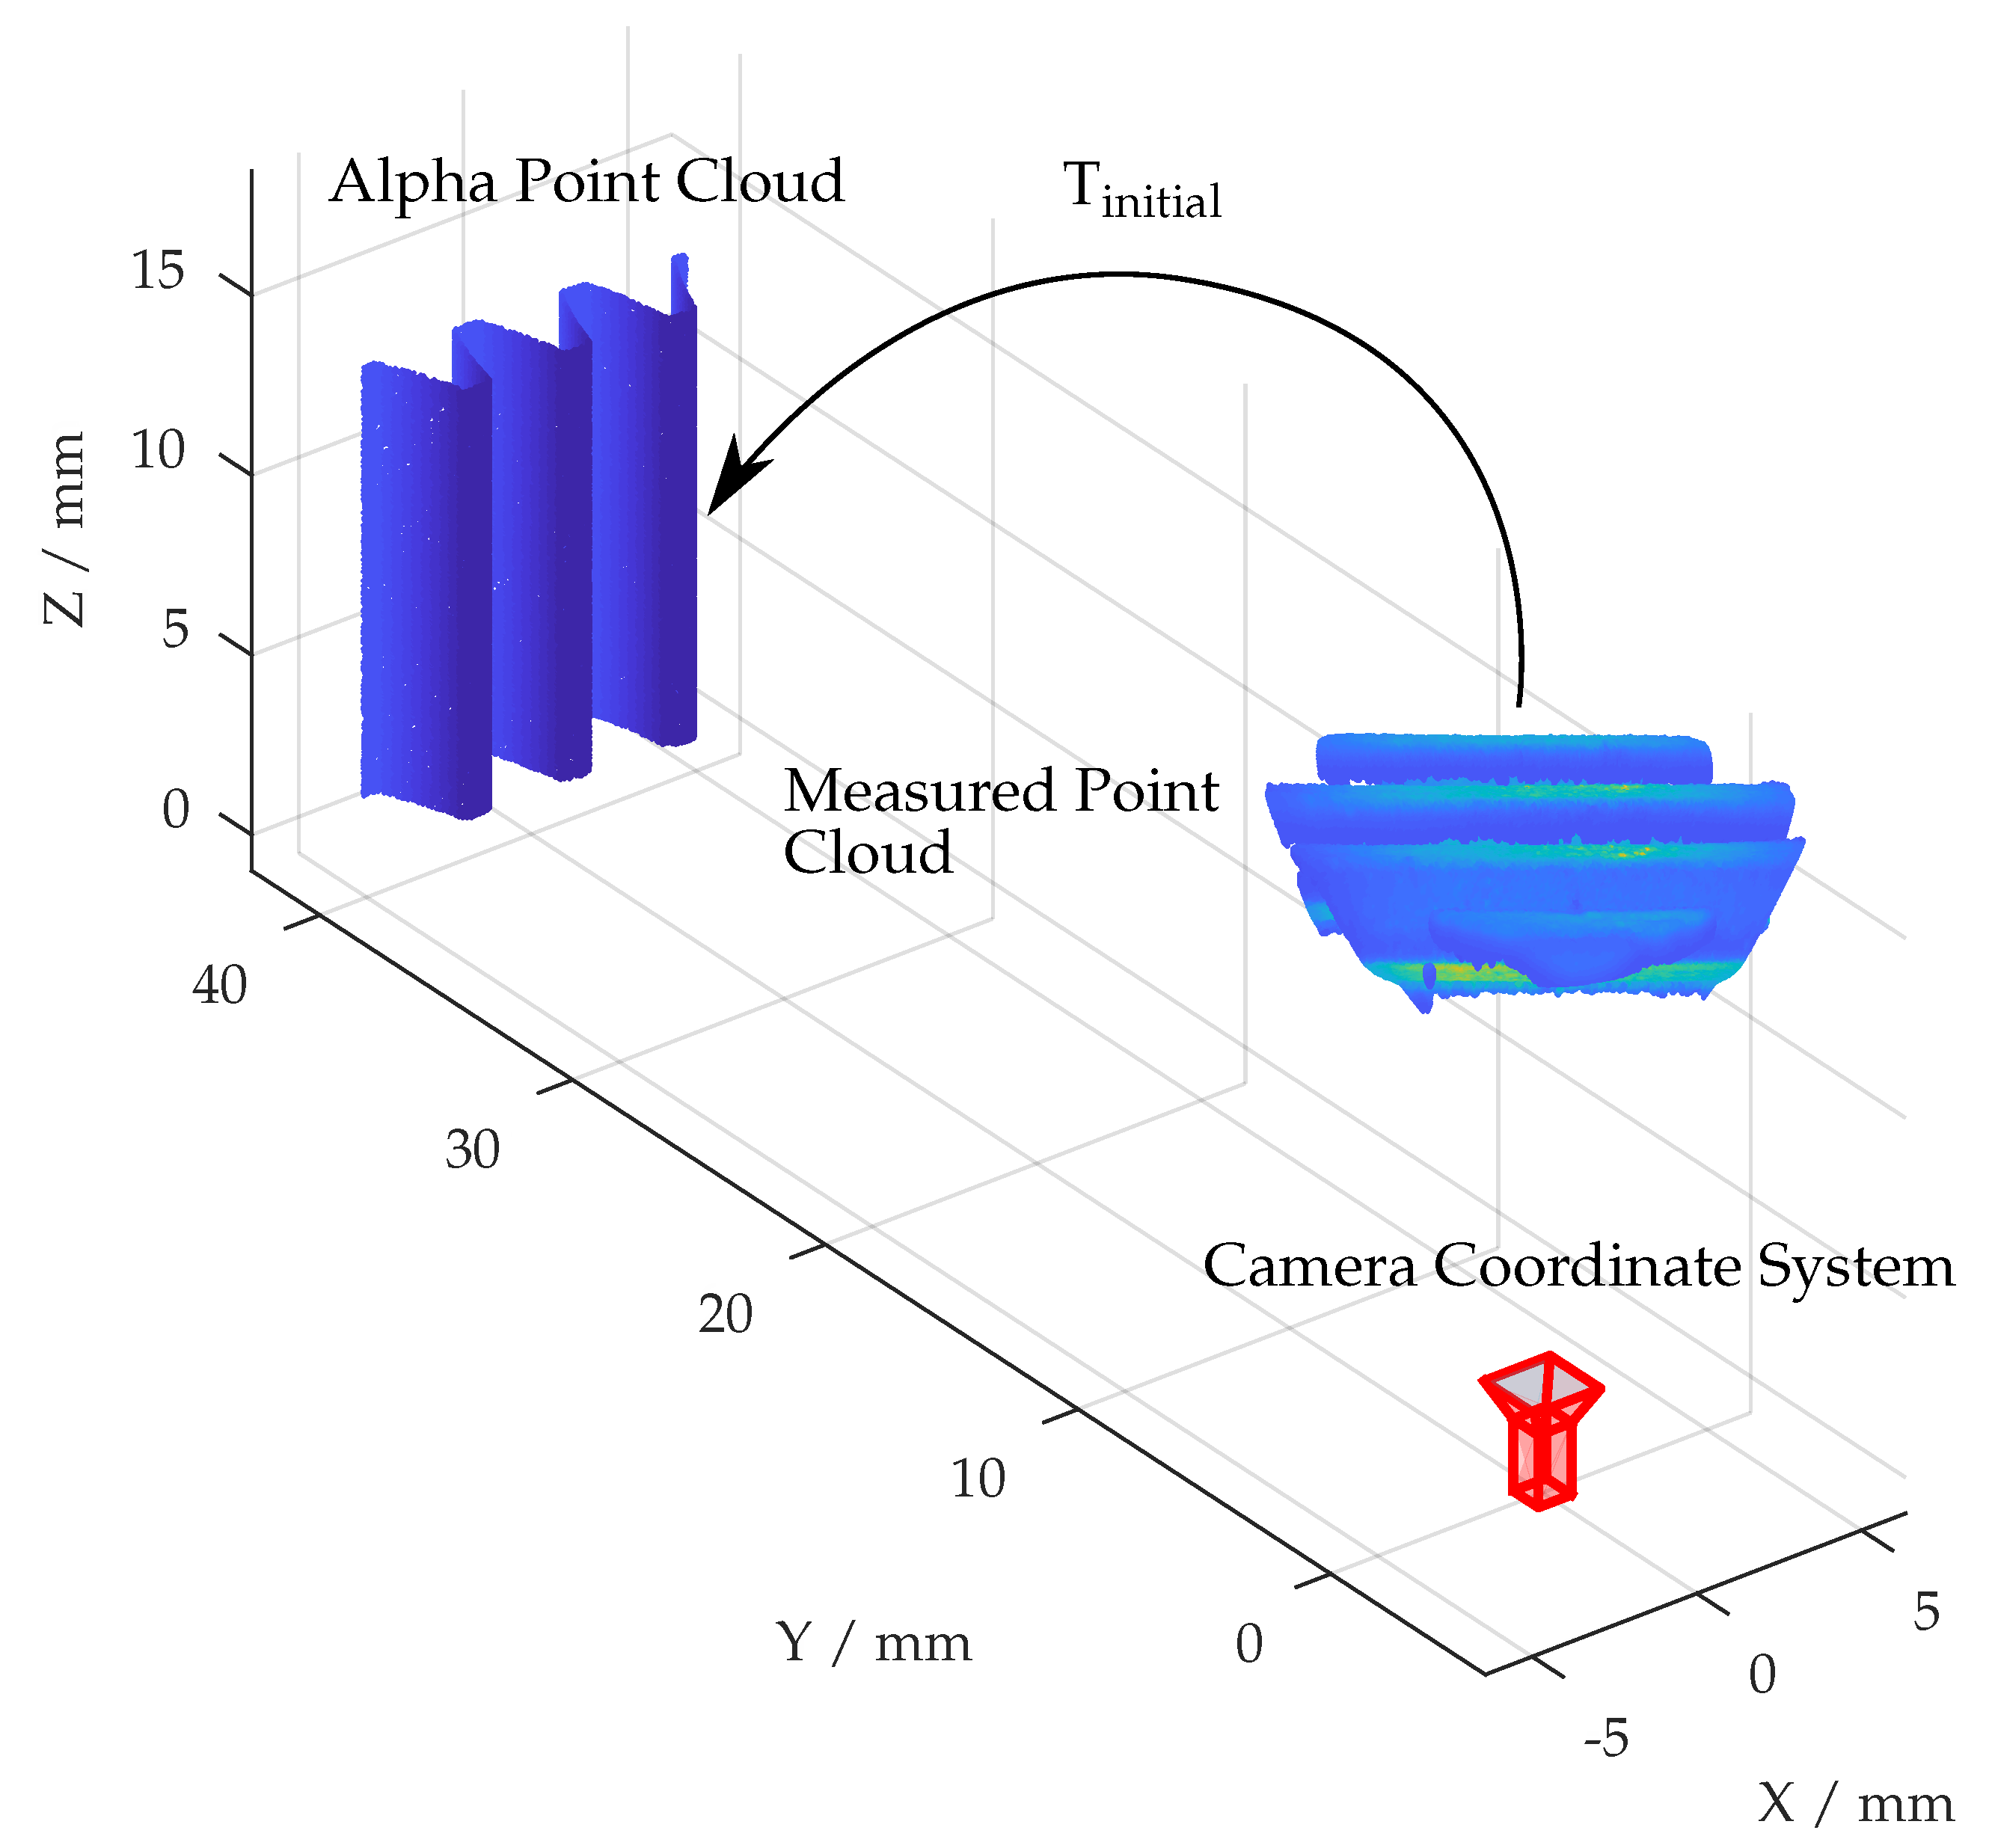 L//W//H Hinz /& Kunst Microscope Measurements article in cm : 10 x 10 x 15